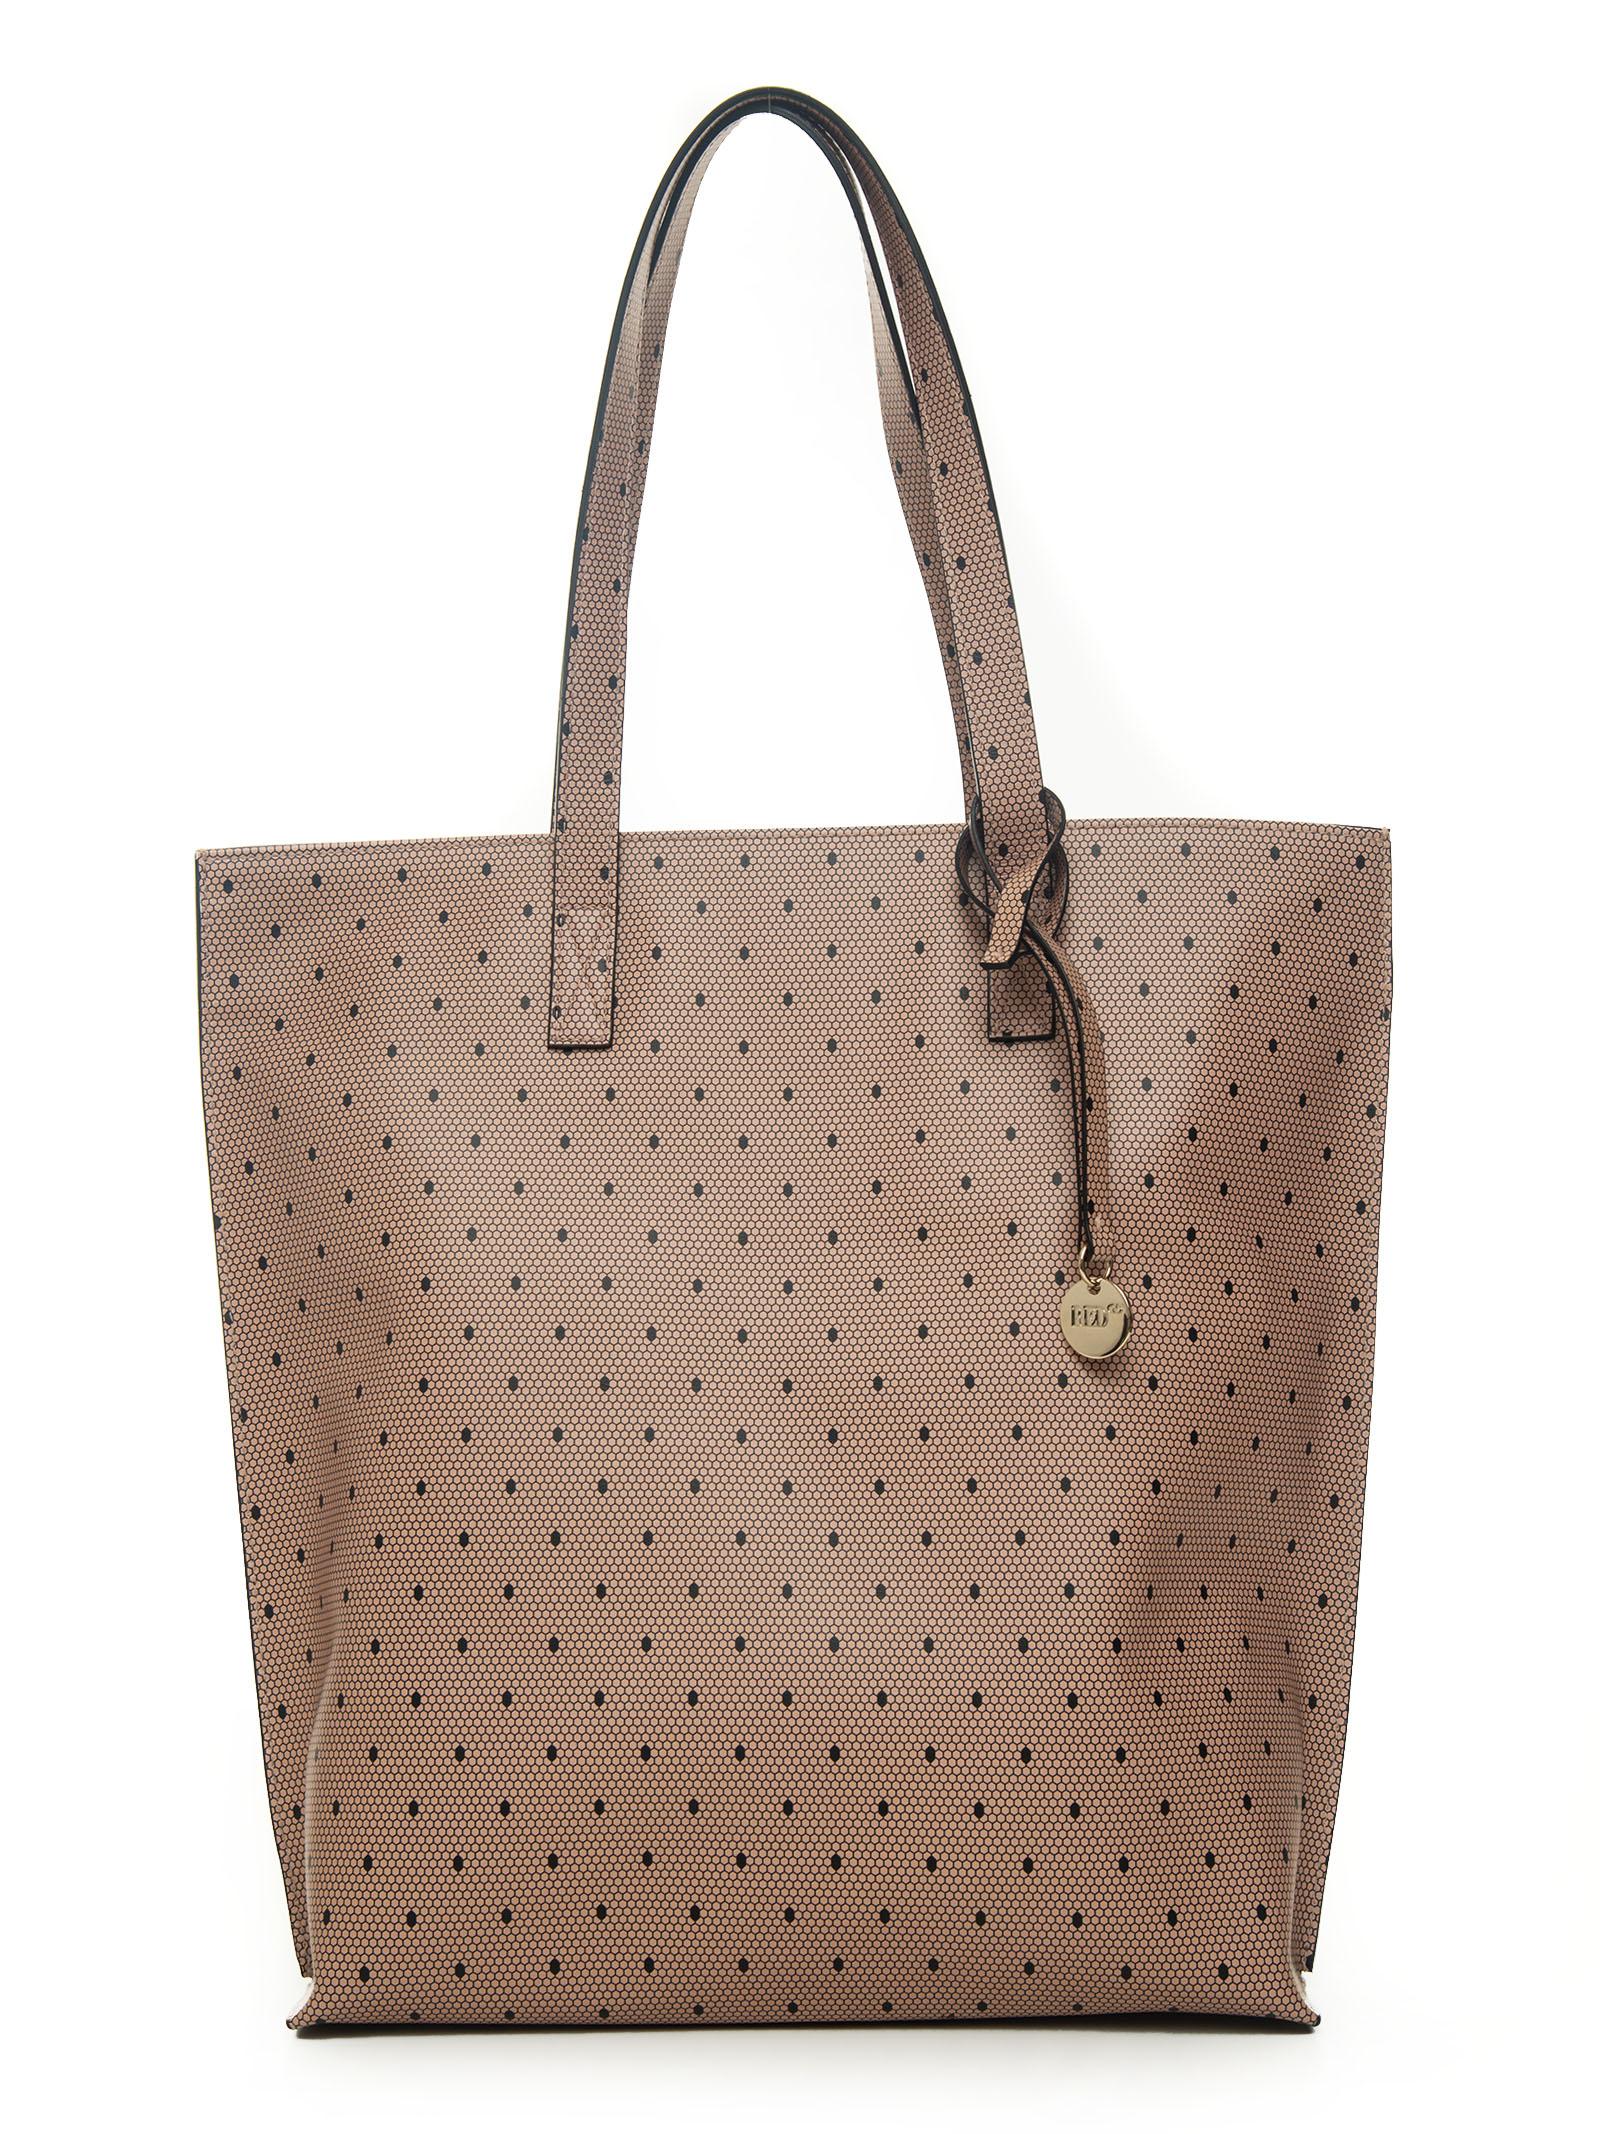 Redv LARGE SHOPPING BAG BEIGE/NERO  WOMAN